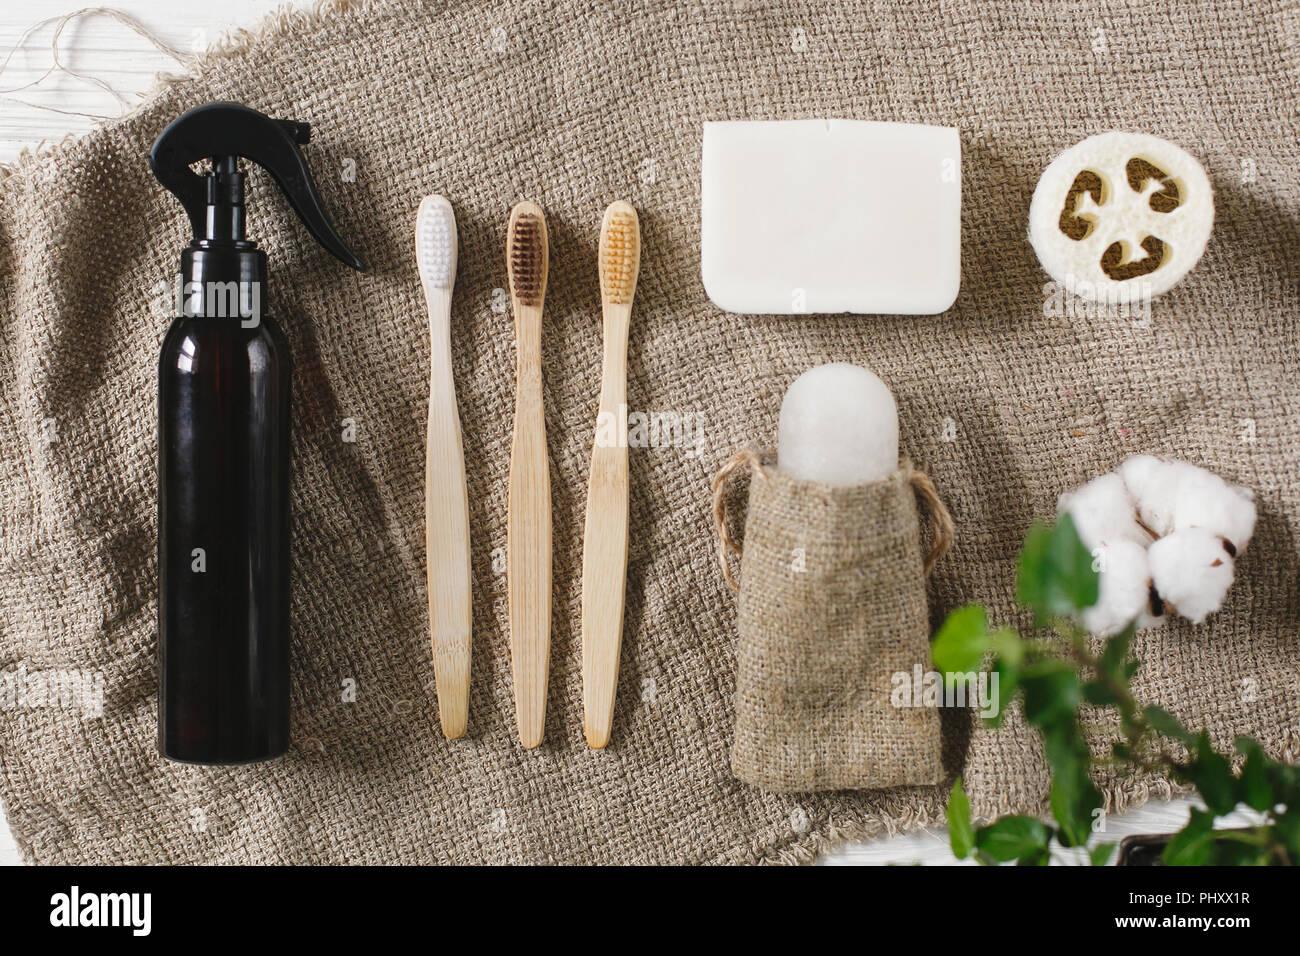 Nachhaltiger Lebensstil Konzept. Eco Natural bamboo Zahnbürste, crystal Deodorant, luffa, Kokos Seife, Baumwolle. Null Abfall flach. Bad Essentials, Stockbild